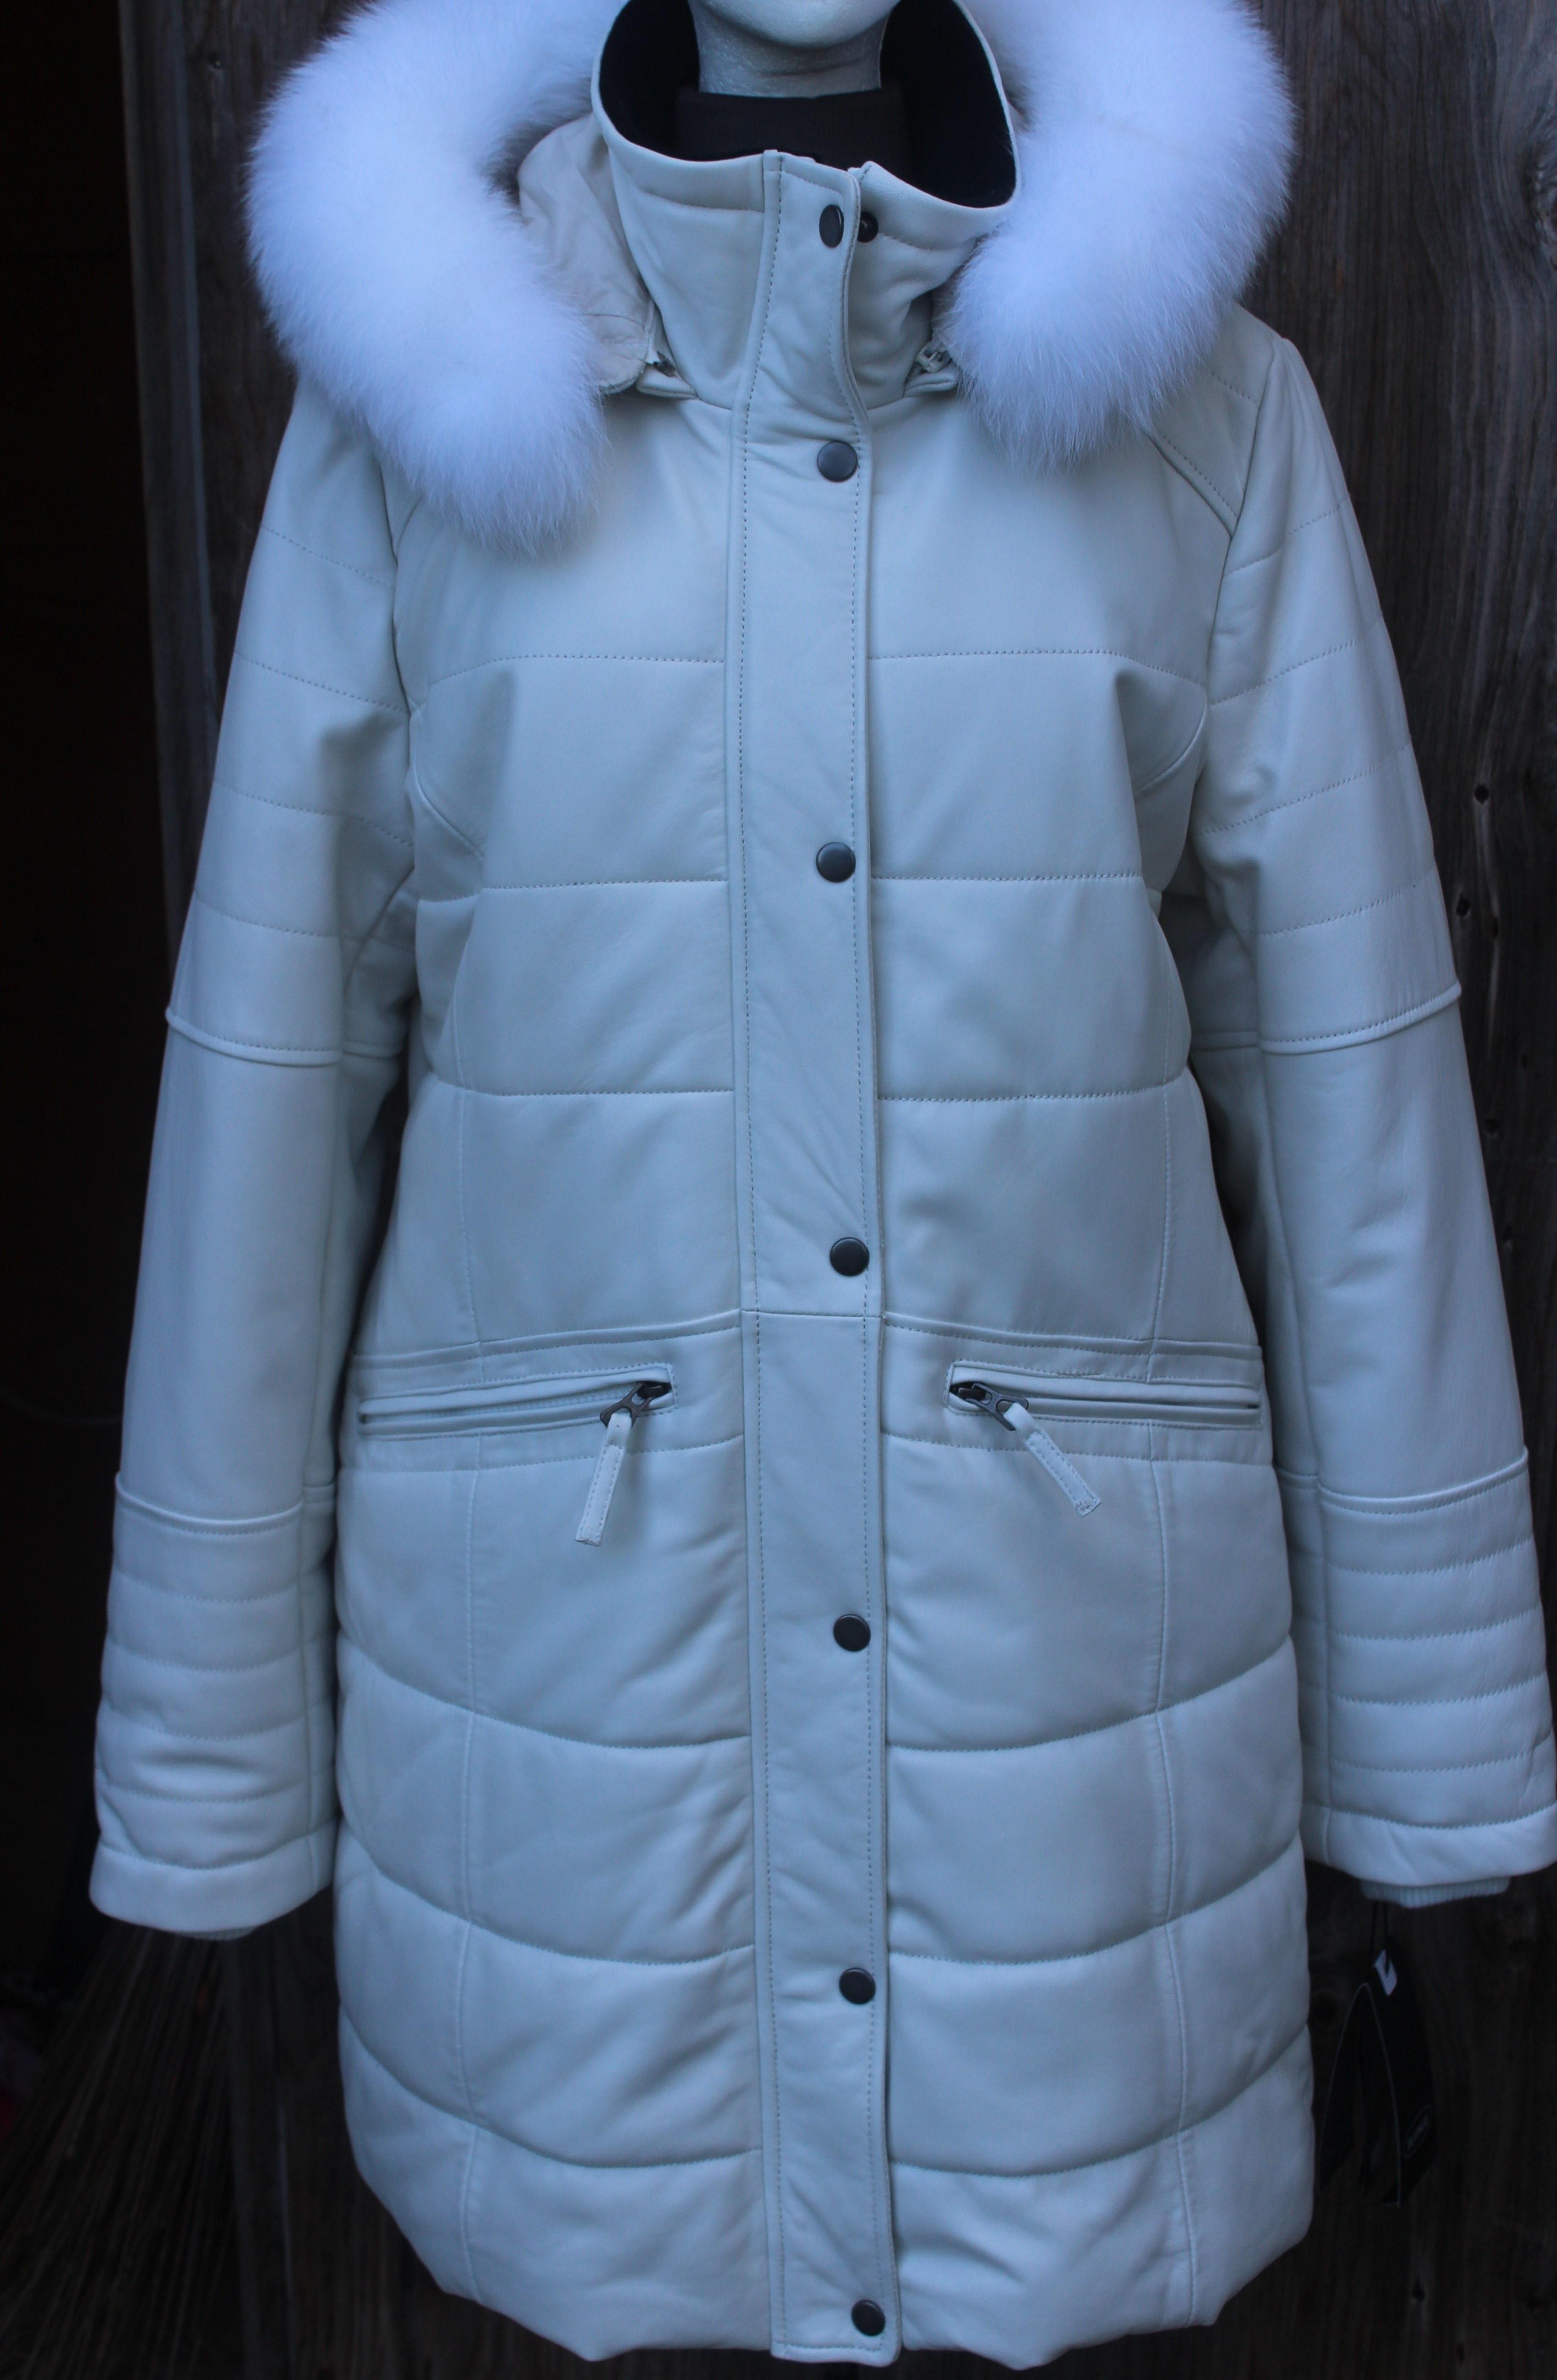 White- $599.95 Plonge; Style #30670W